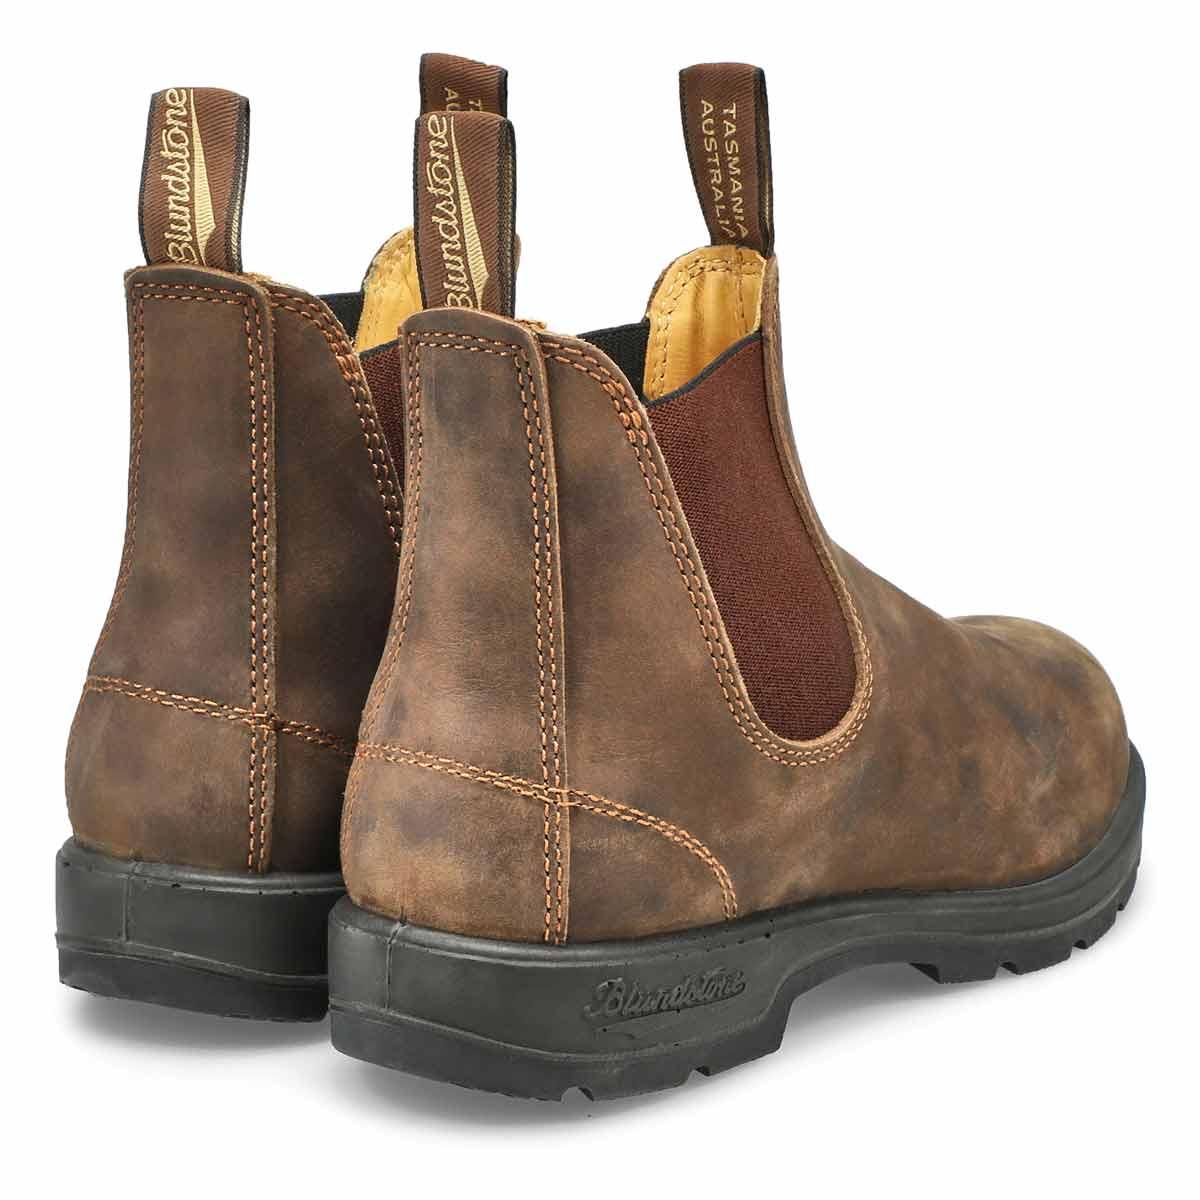 Unisex Original rustic brn pull on boot